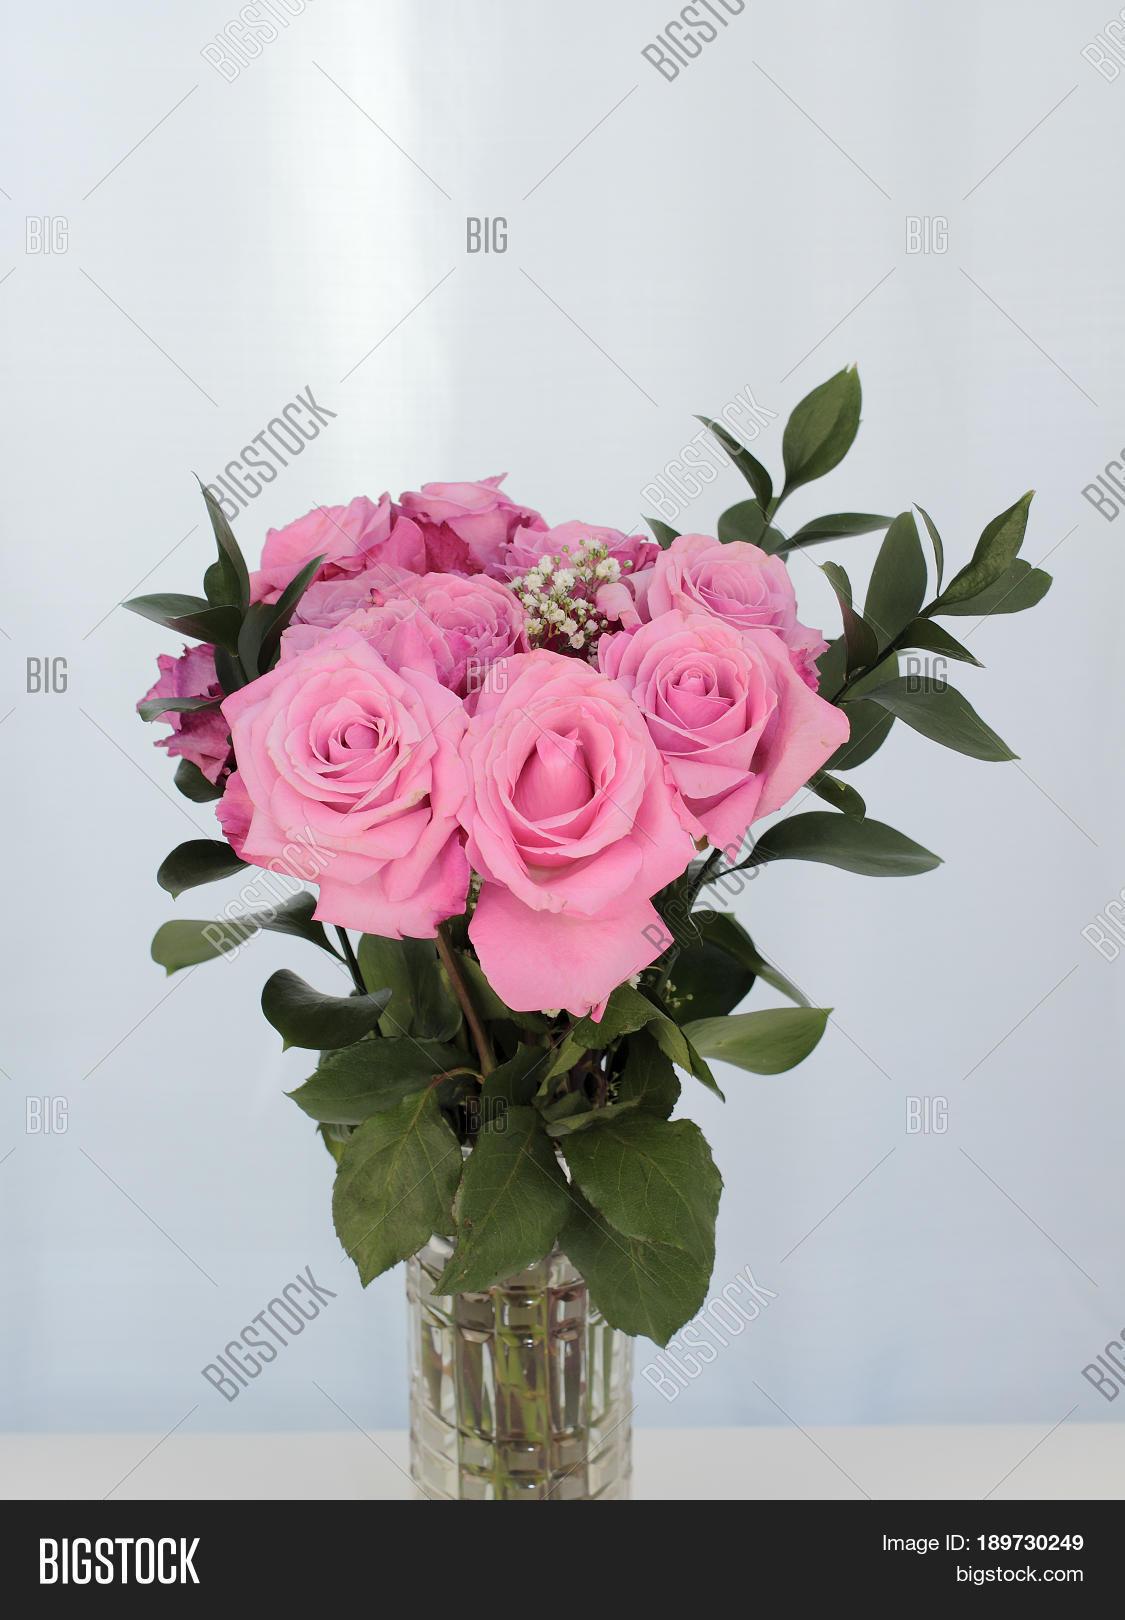 Vibrant Pink Rose Image Photo Free Trial Bigstock